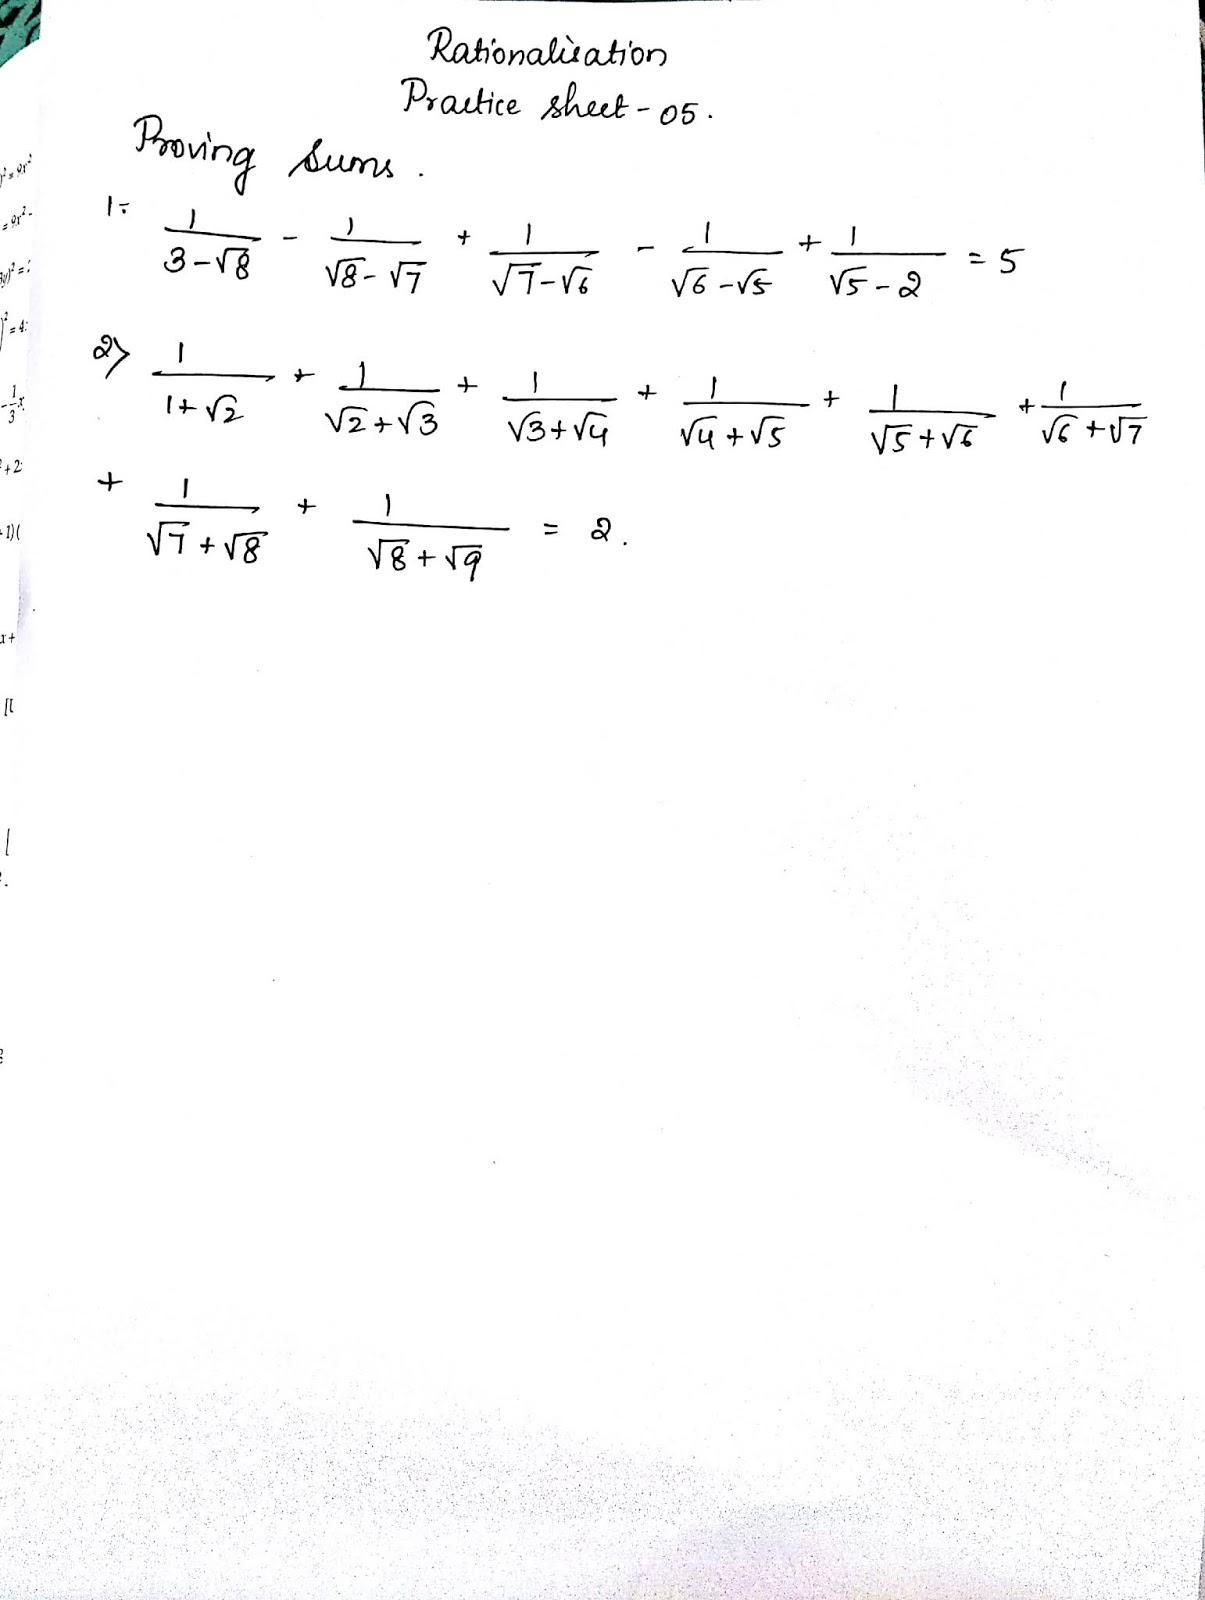 Cbse Icse Class 9 Rationalisation Practice Sheets